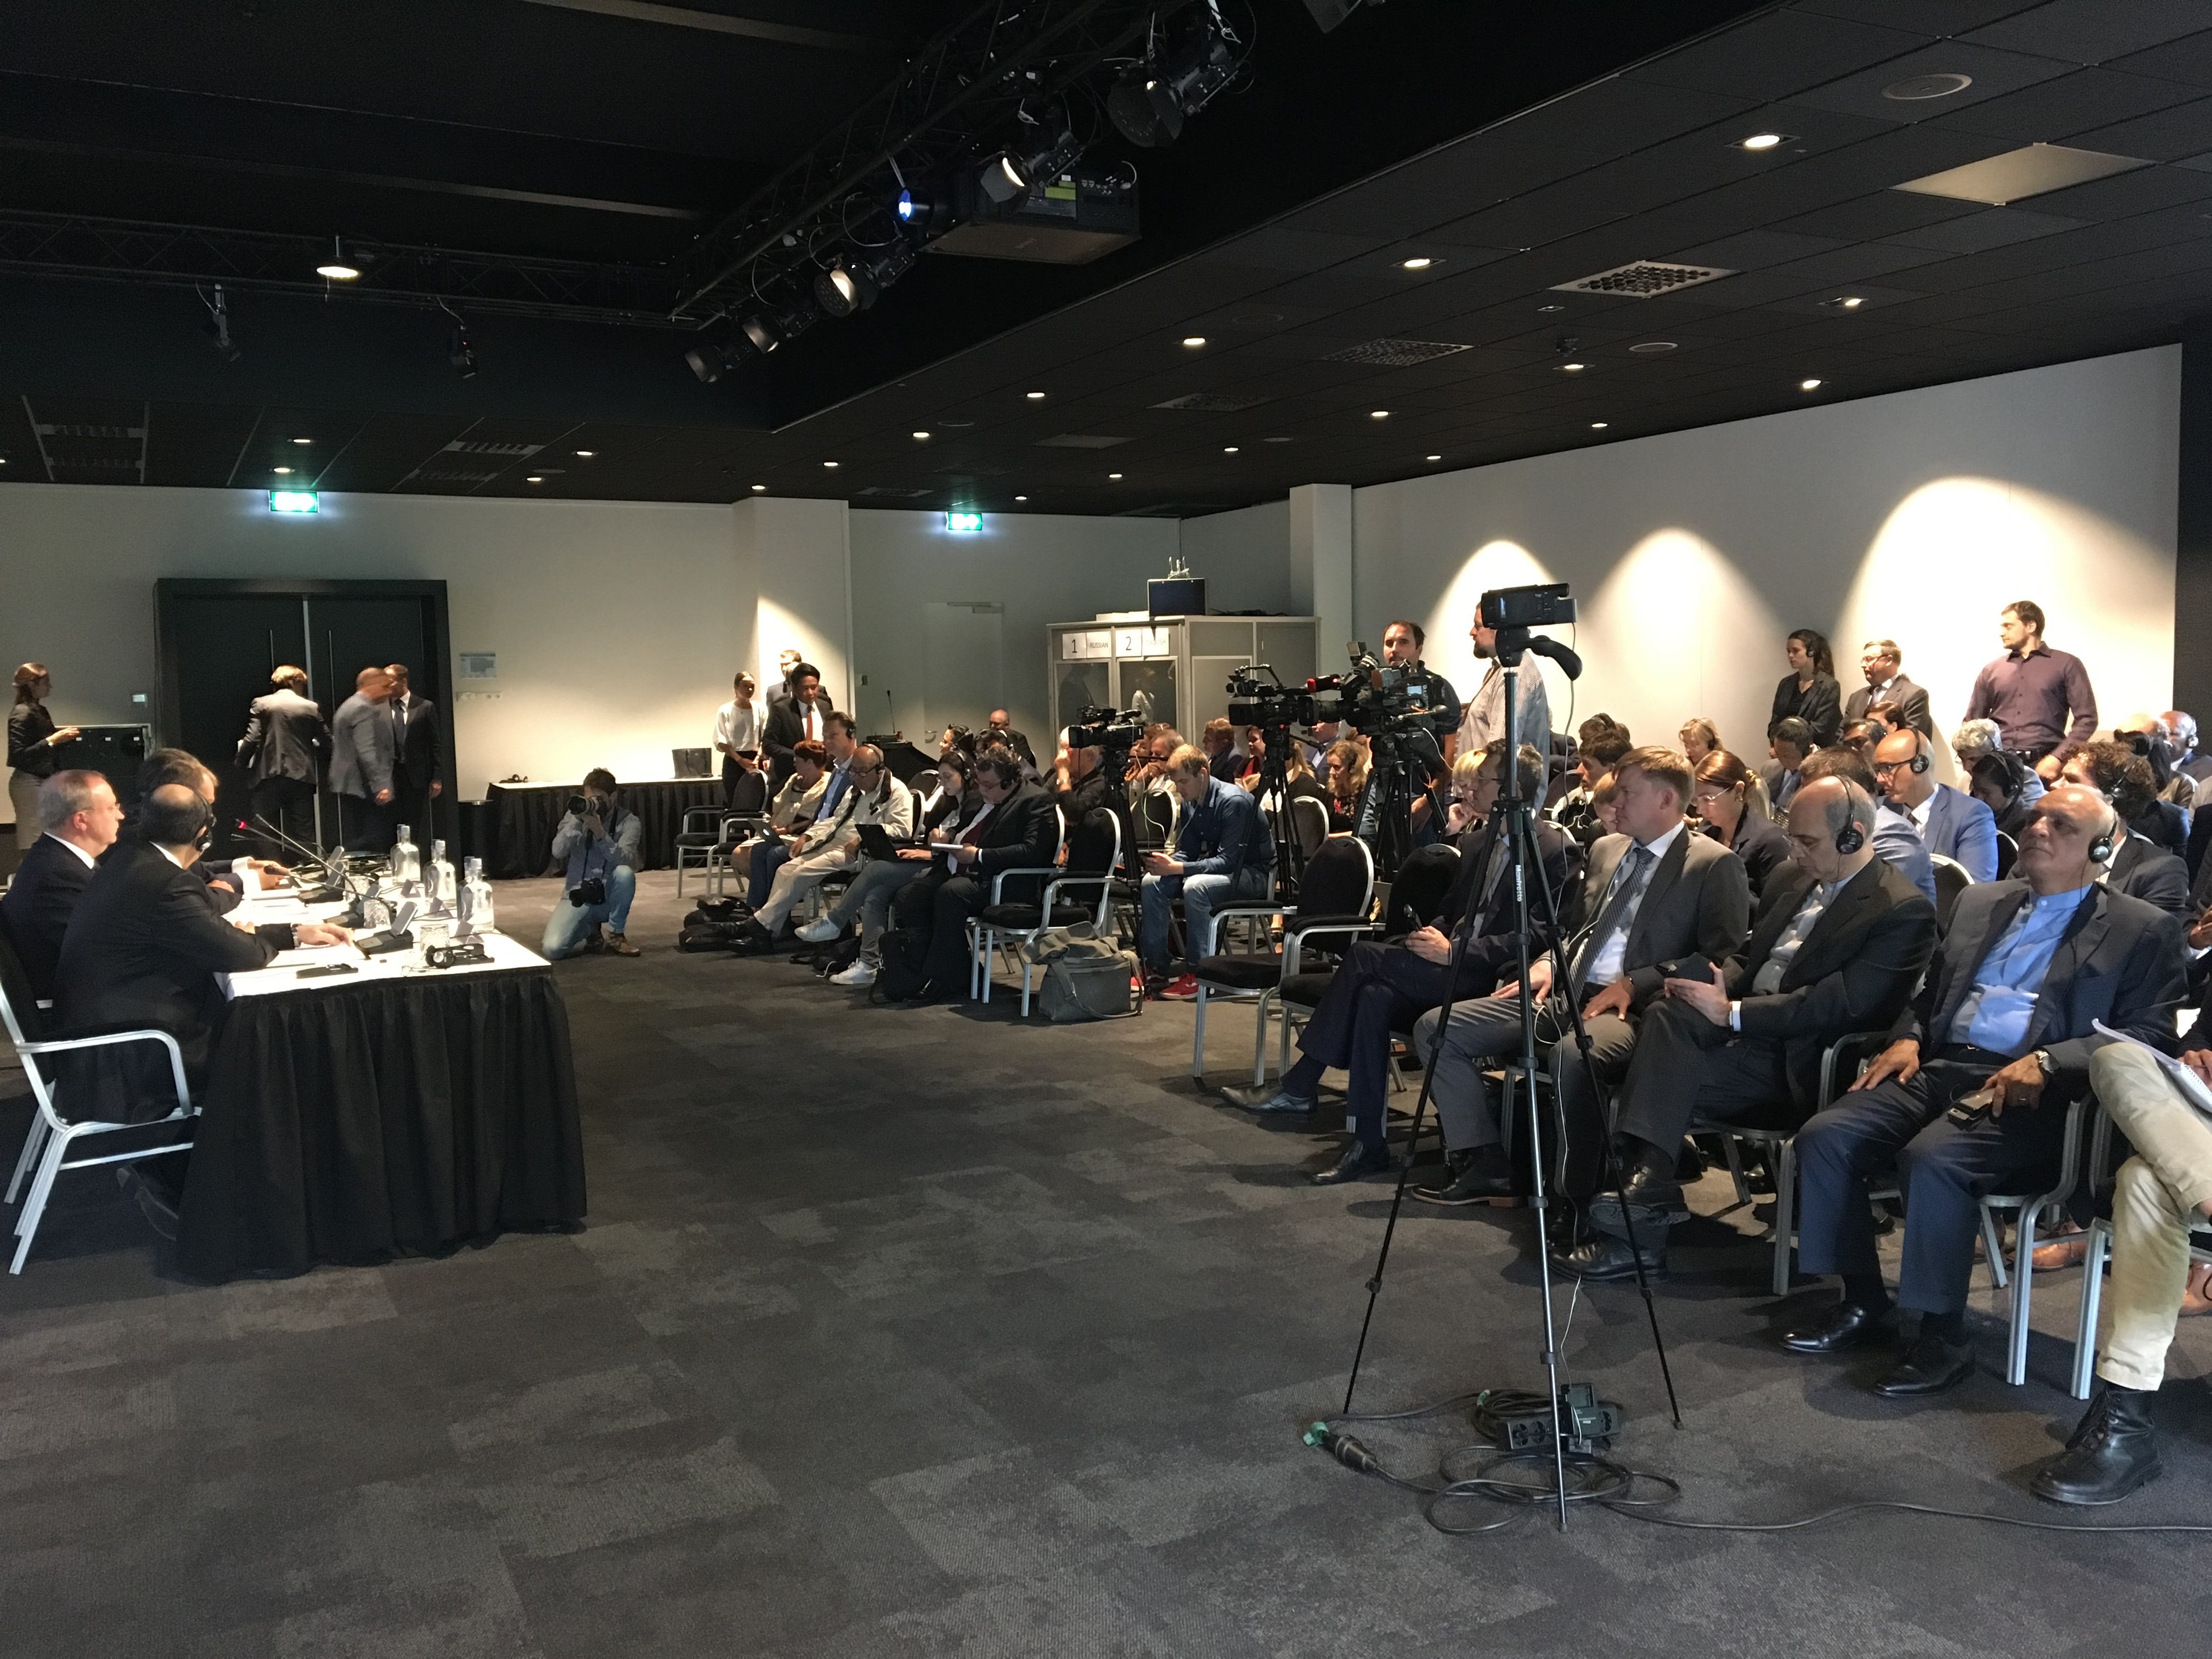 instagr news conference held - HD1200×900